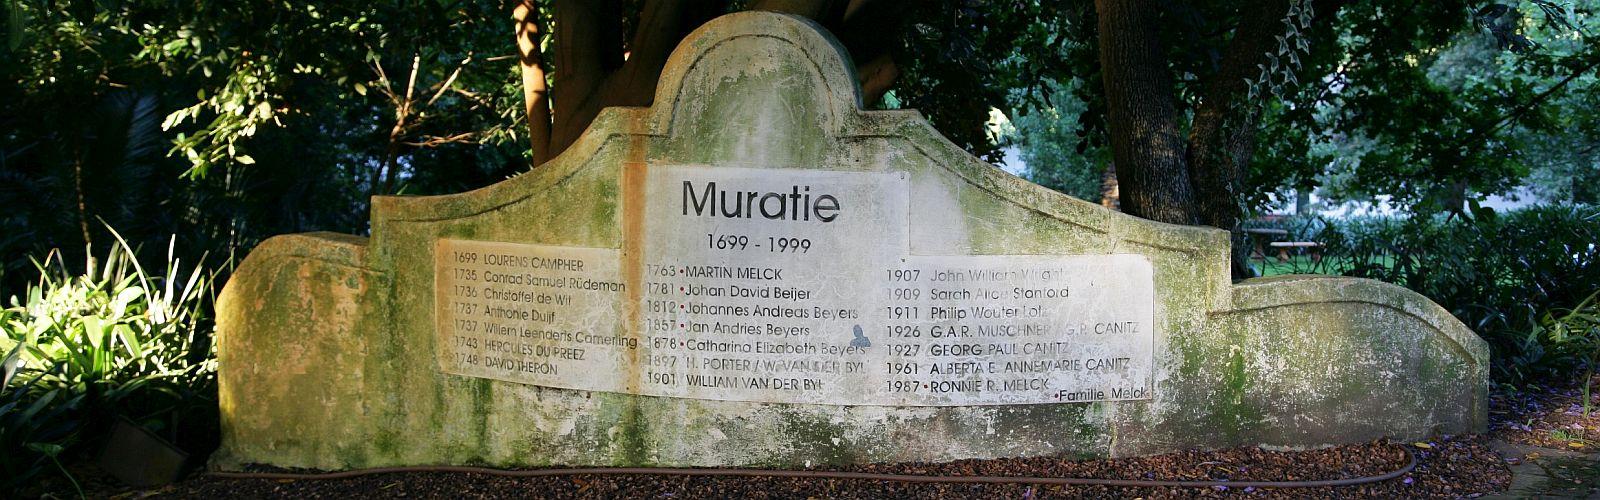 Muratie Wine Estate